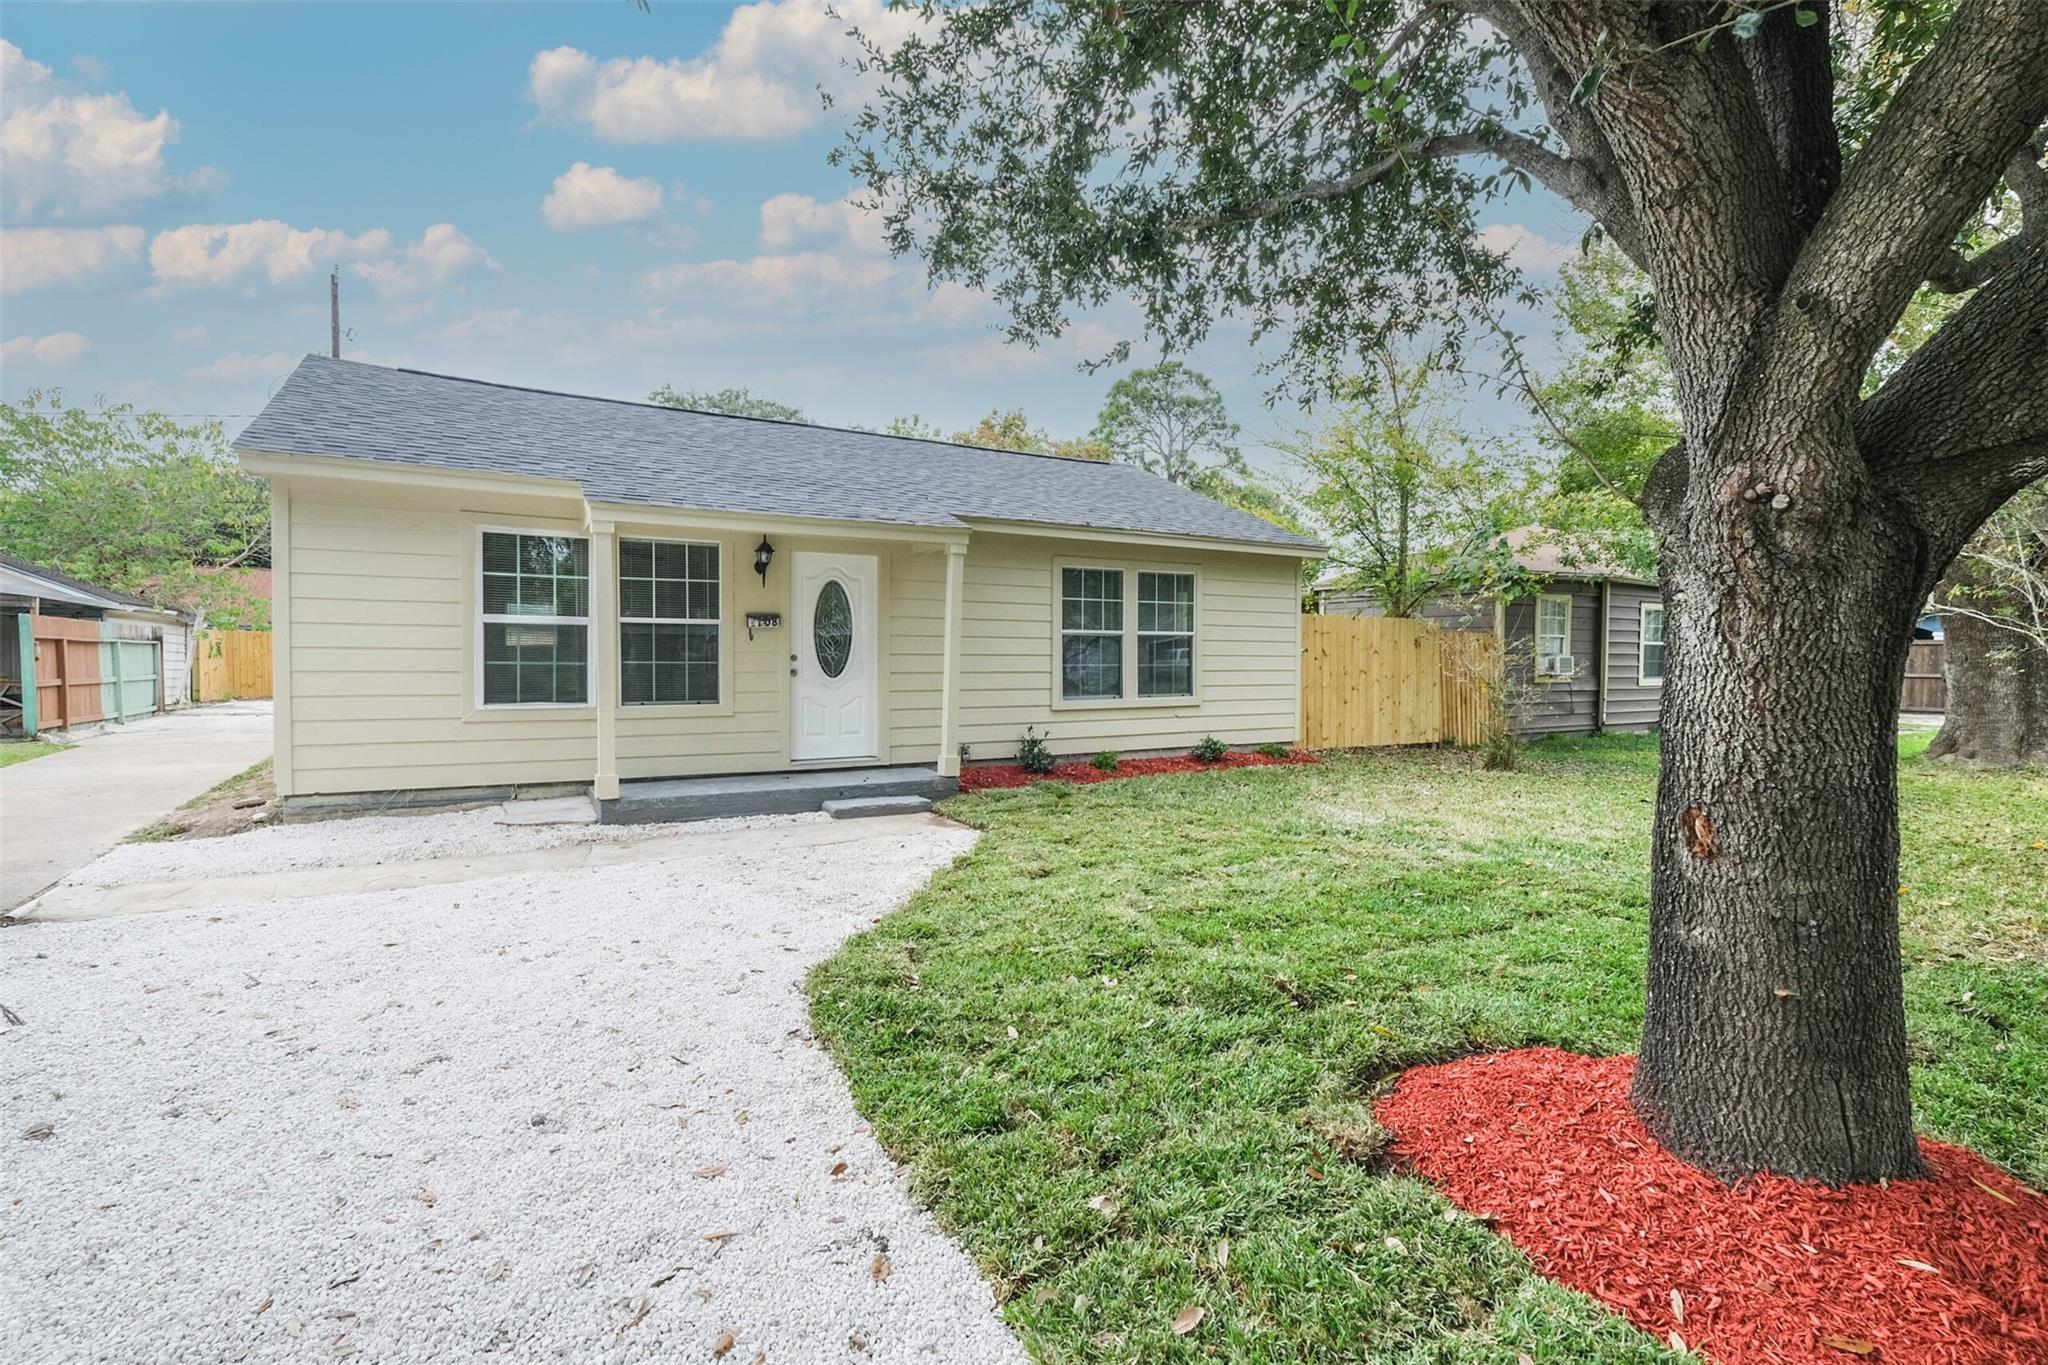 2108 6 Street Property Photo - Galena Park, TX real estate listing